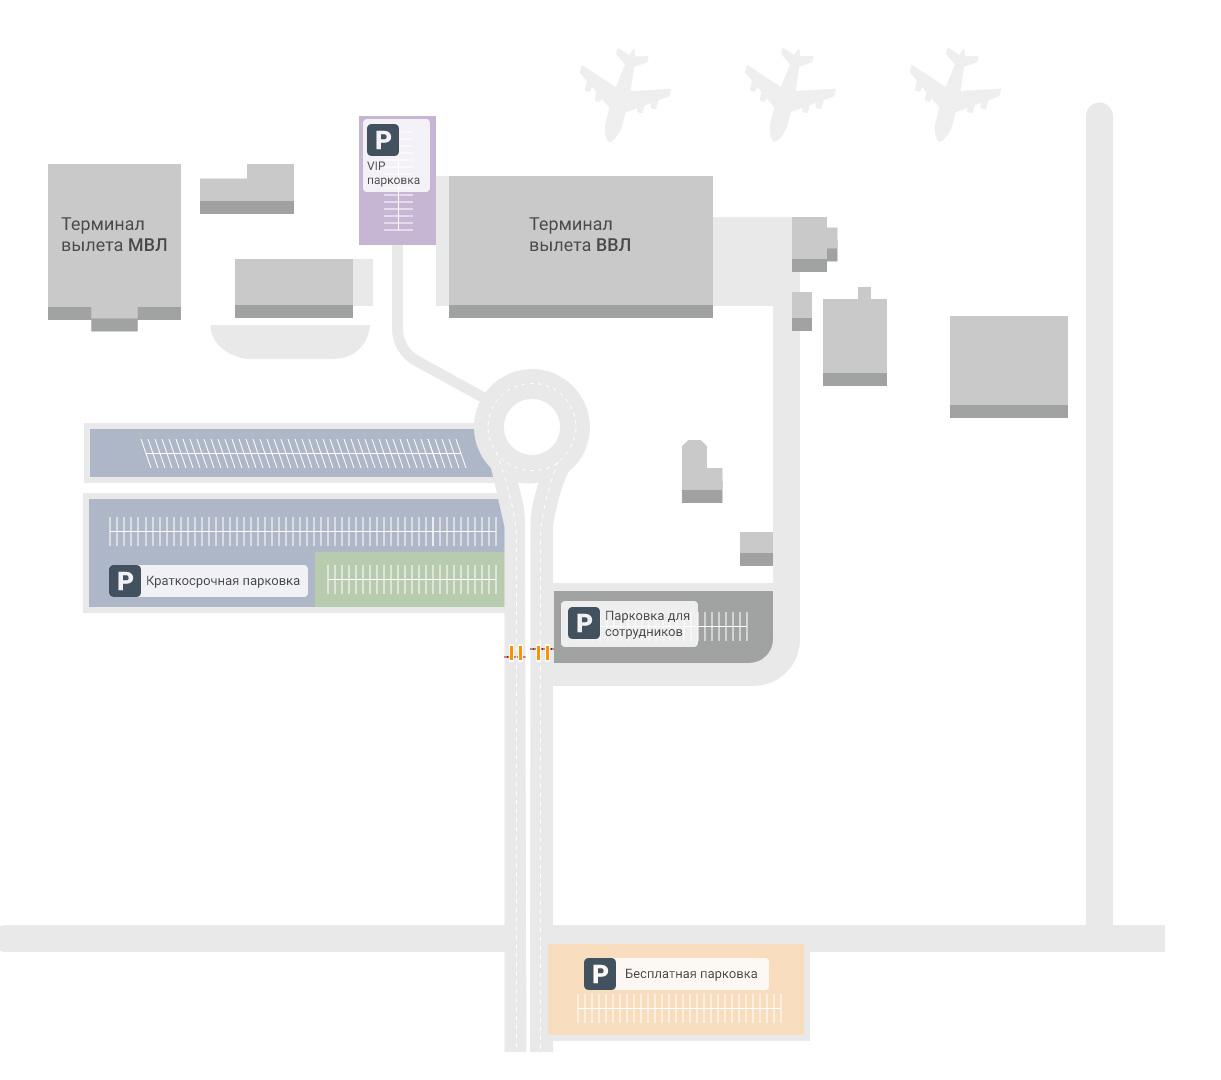 Карта-схема терминалов аэропорта Владикавказ